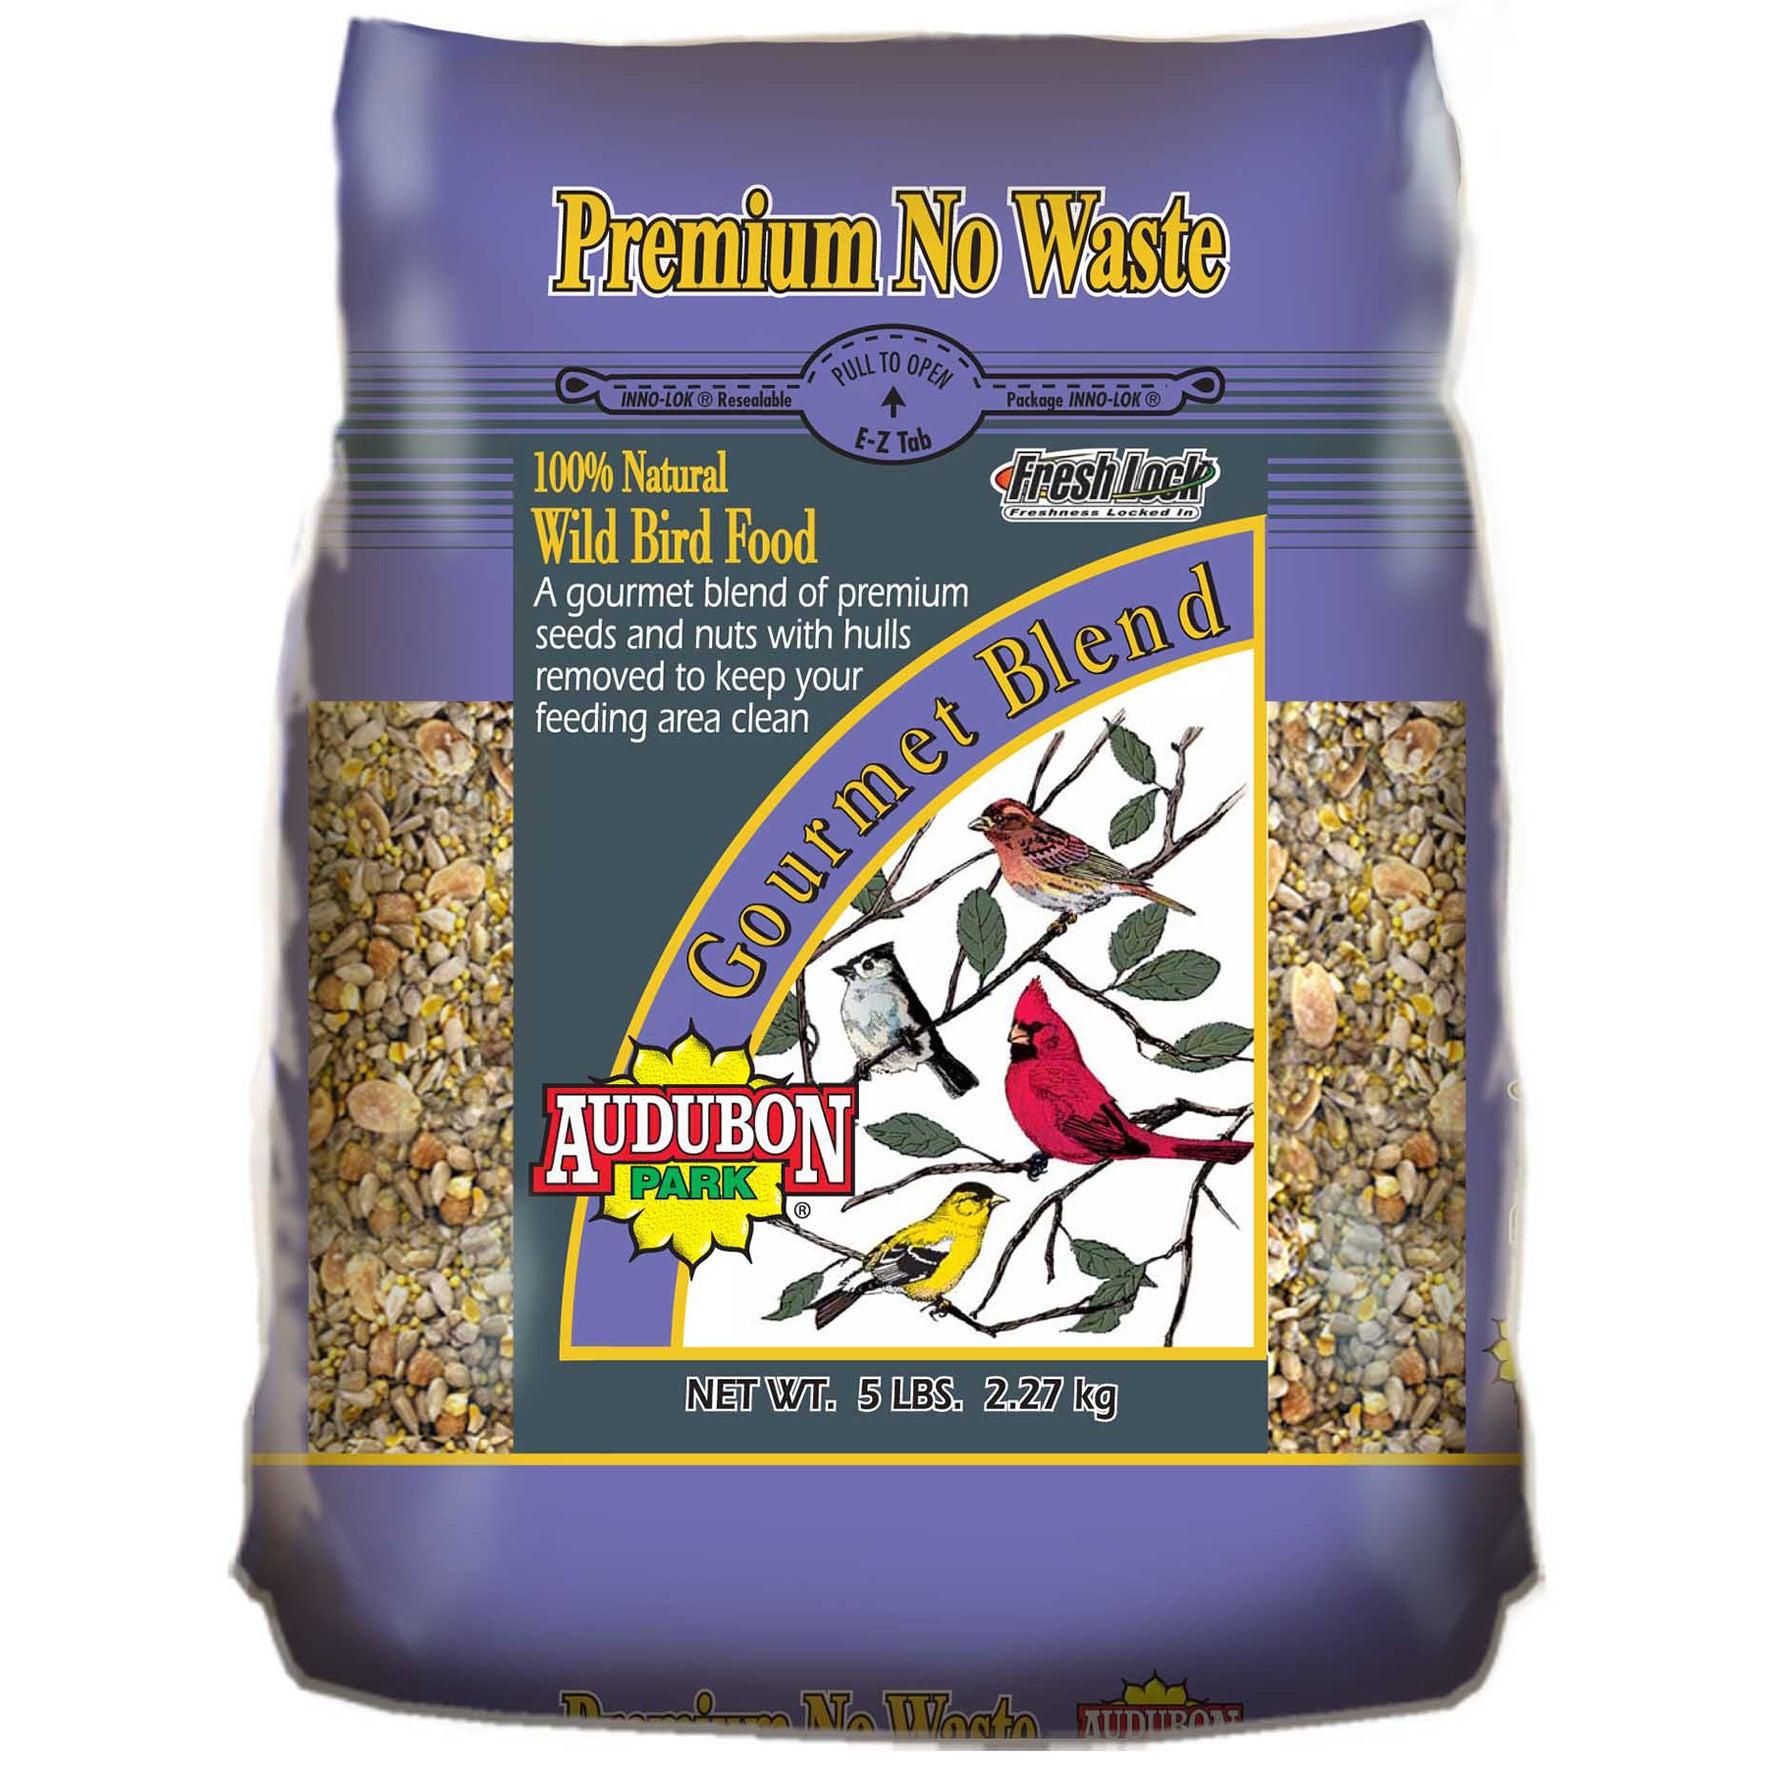 Audubon Park 5 lb Premium No Waste Wild Bird Food (5 lb)